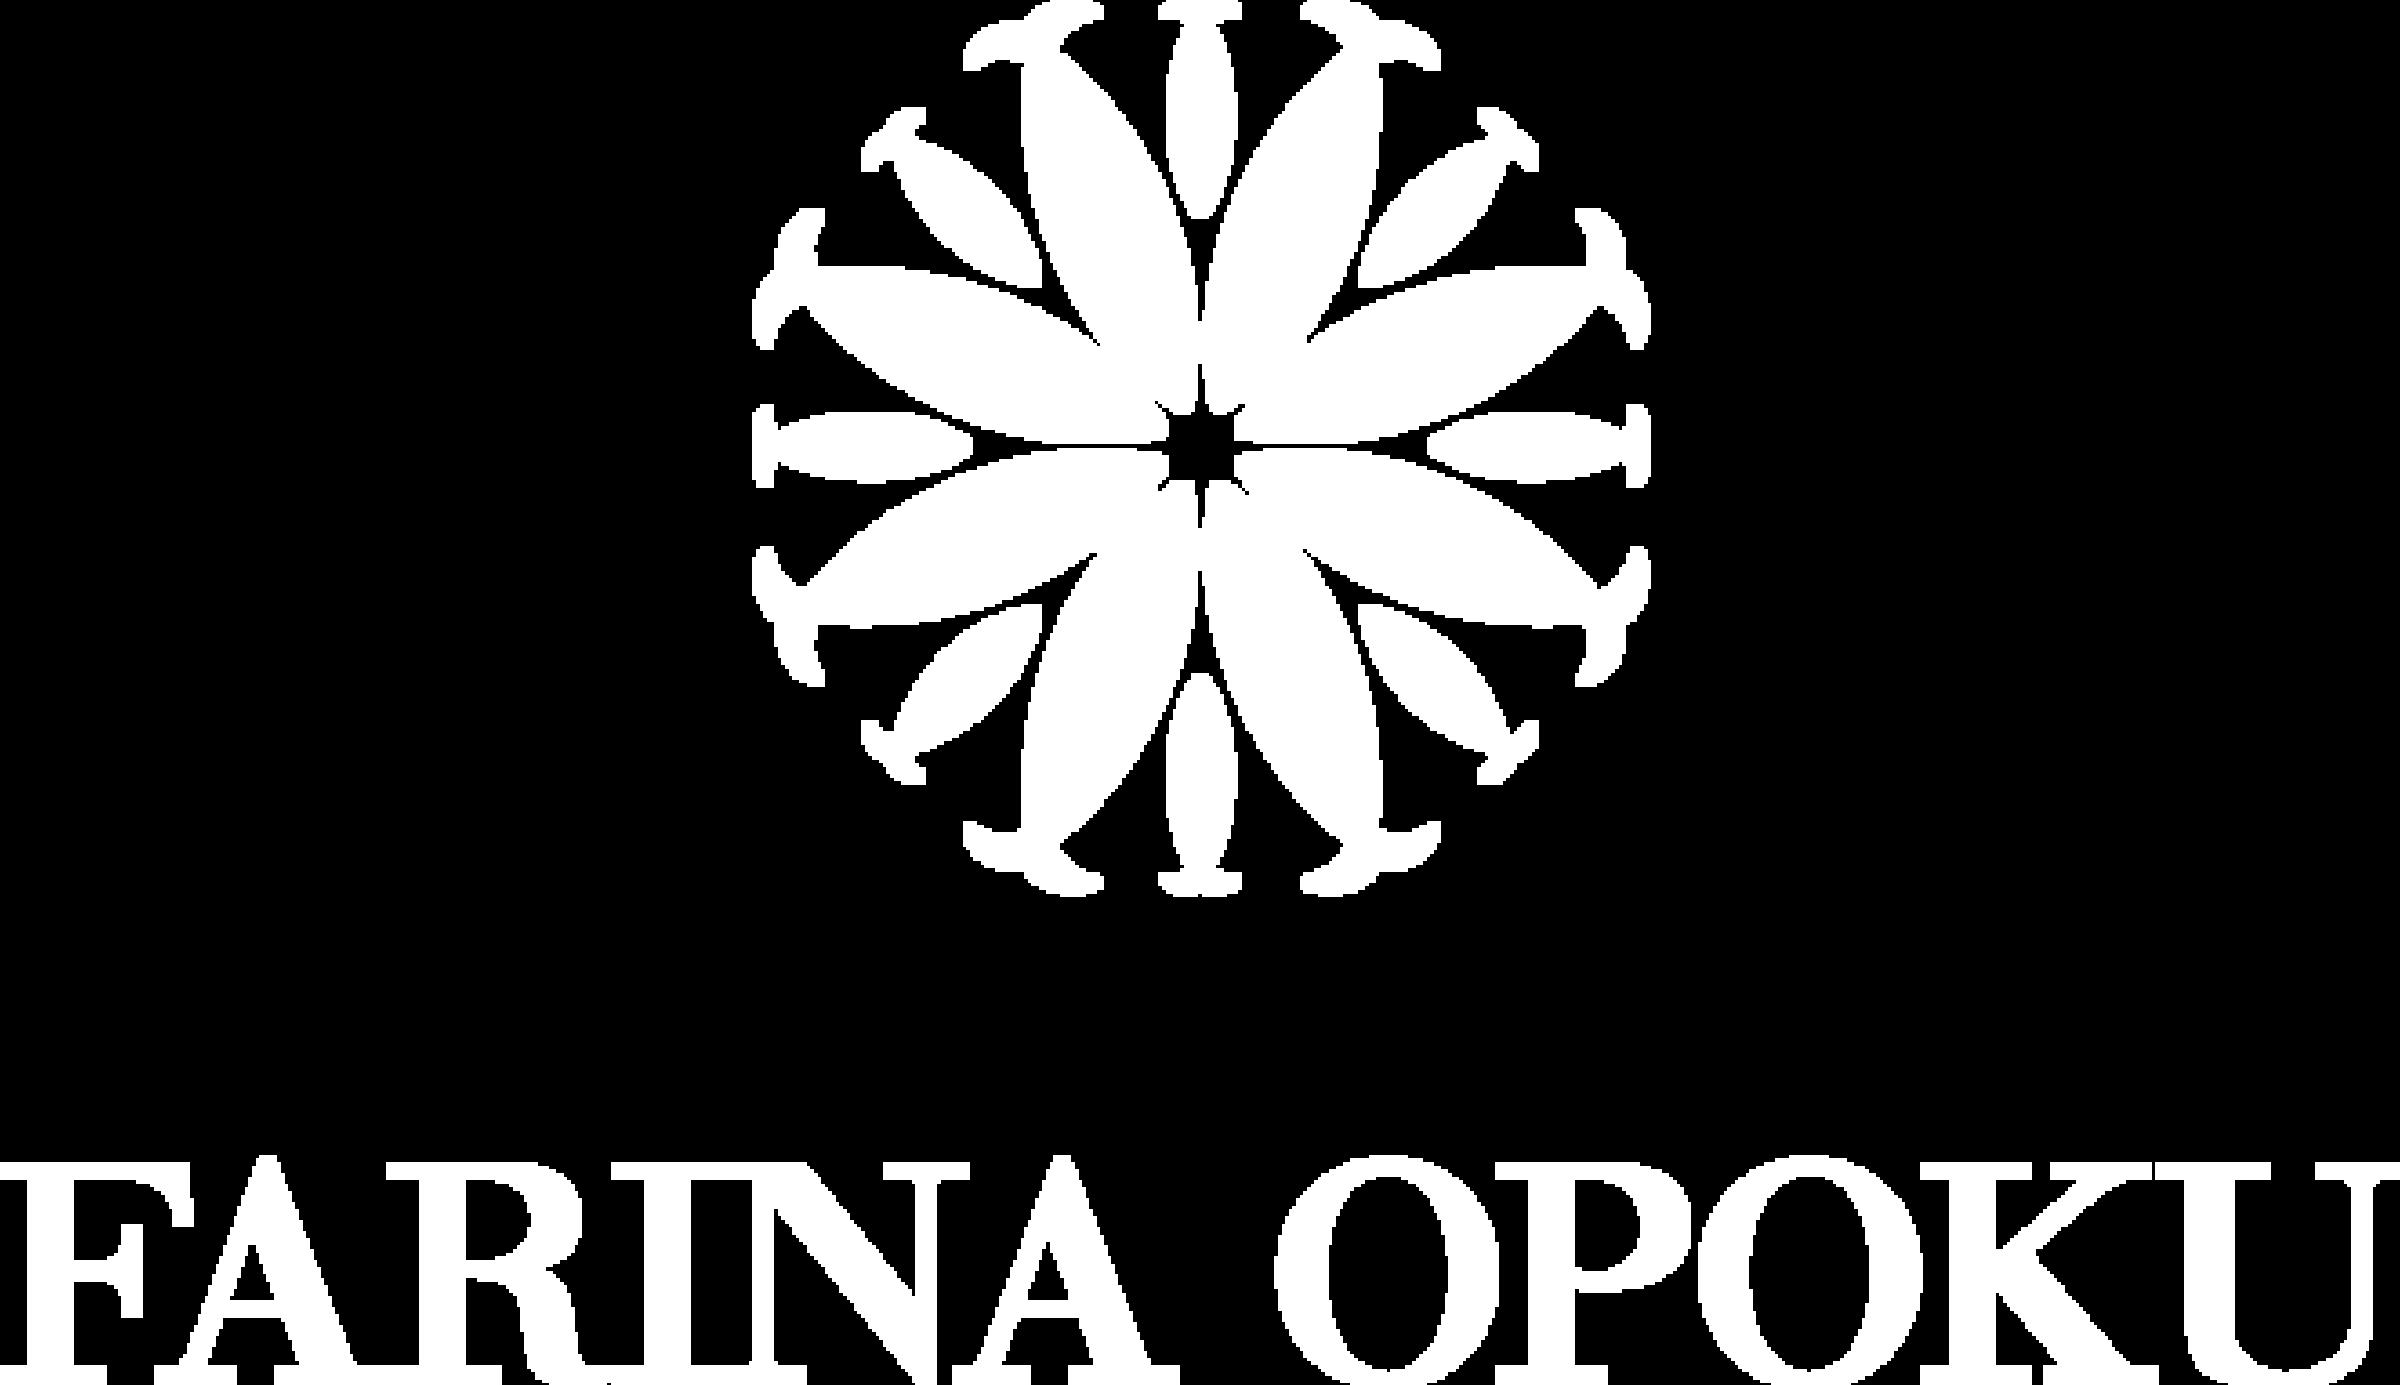 Farina Opoku Logo